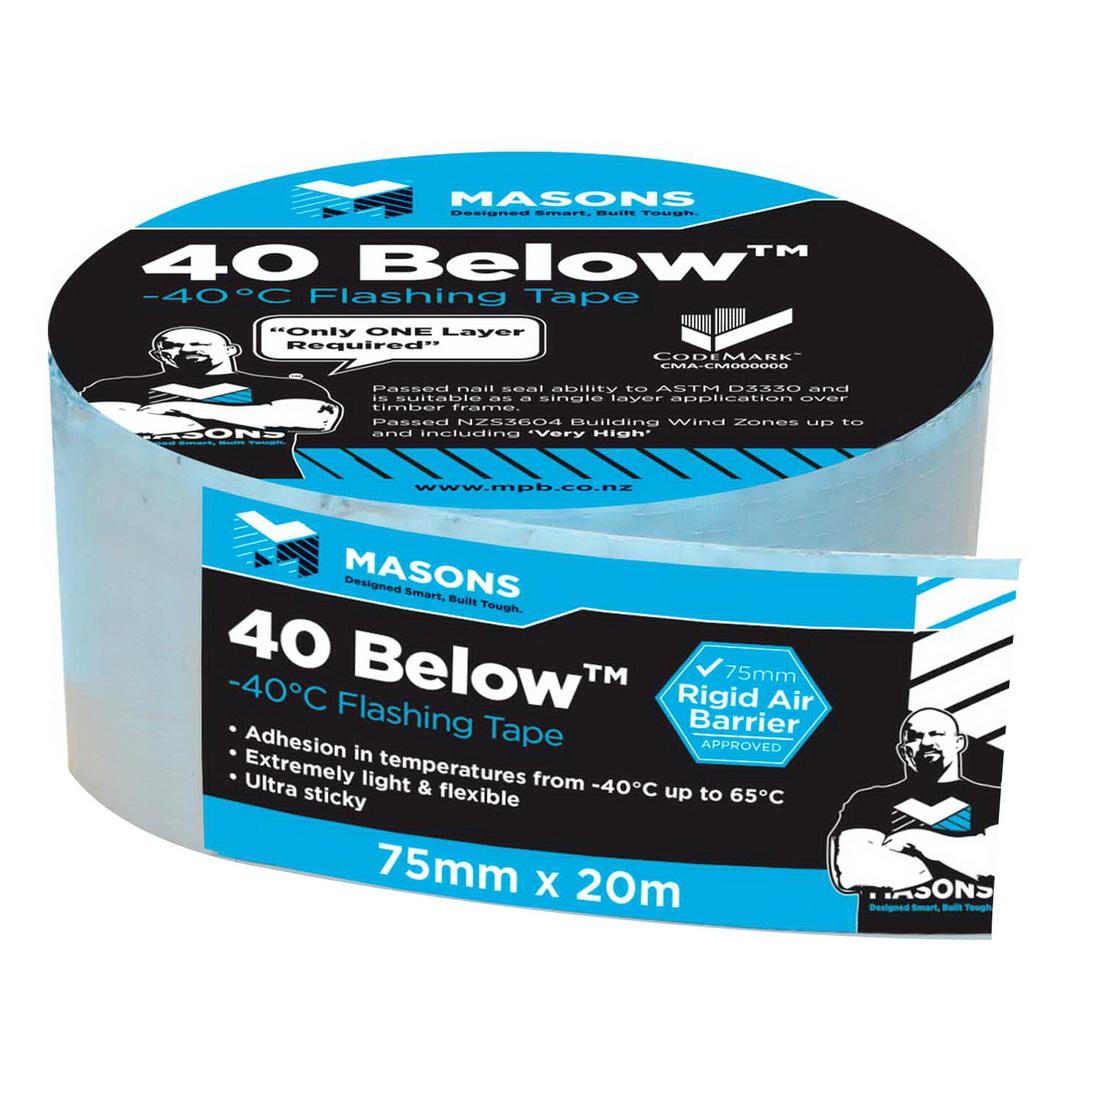 40 Below Flashing Tape 75mm x 20m